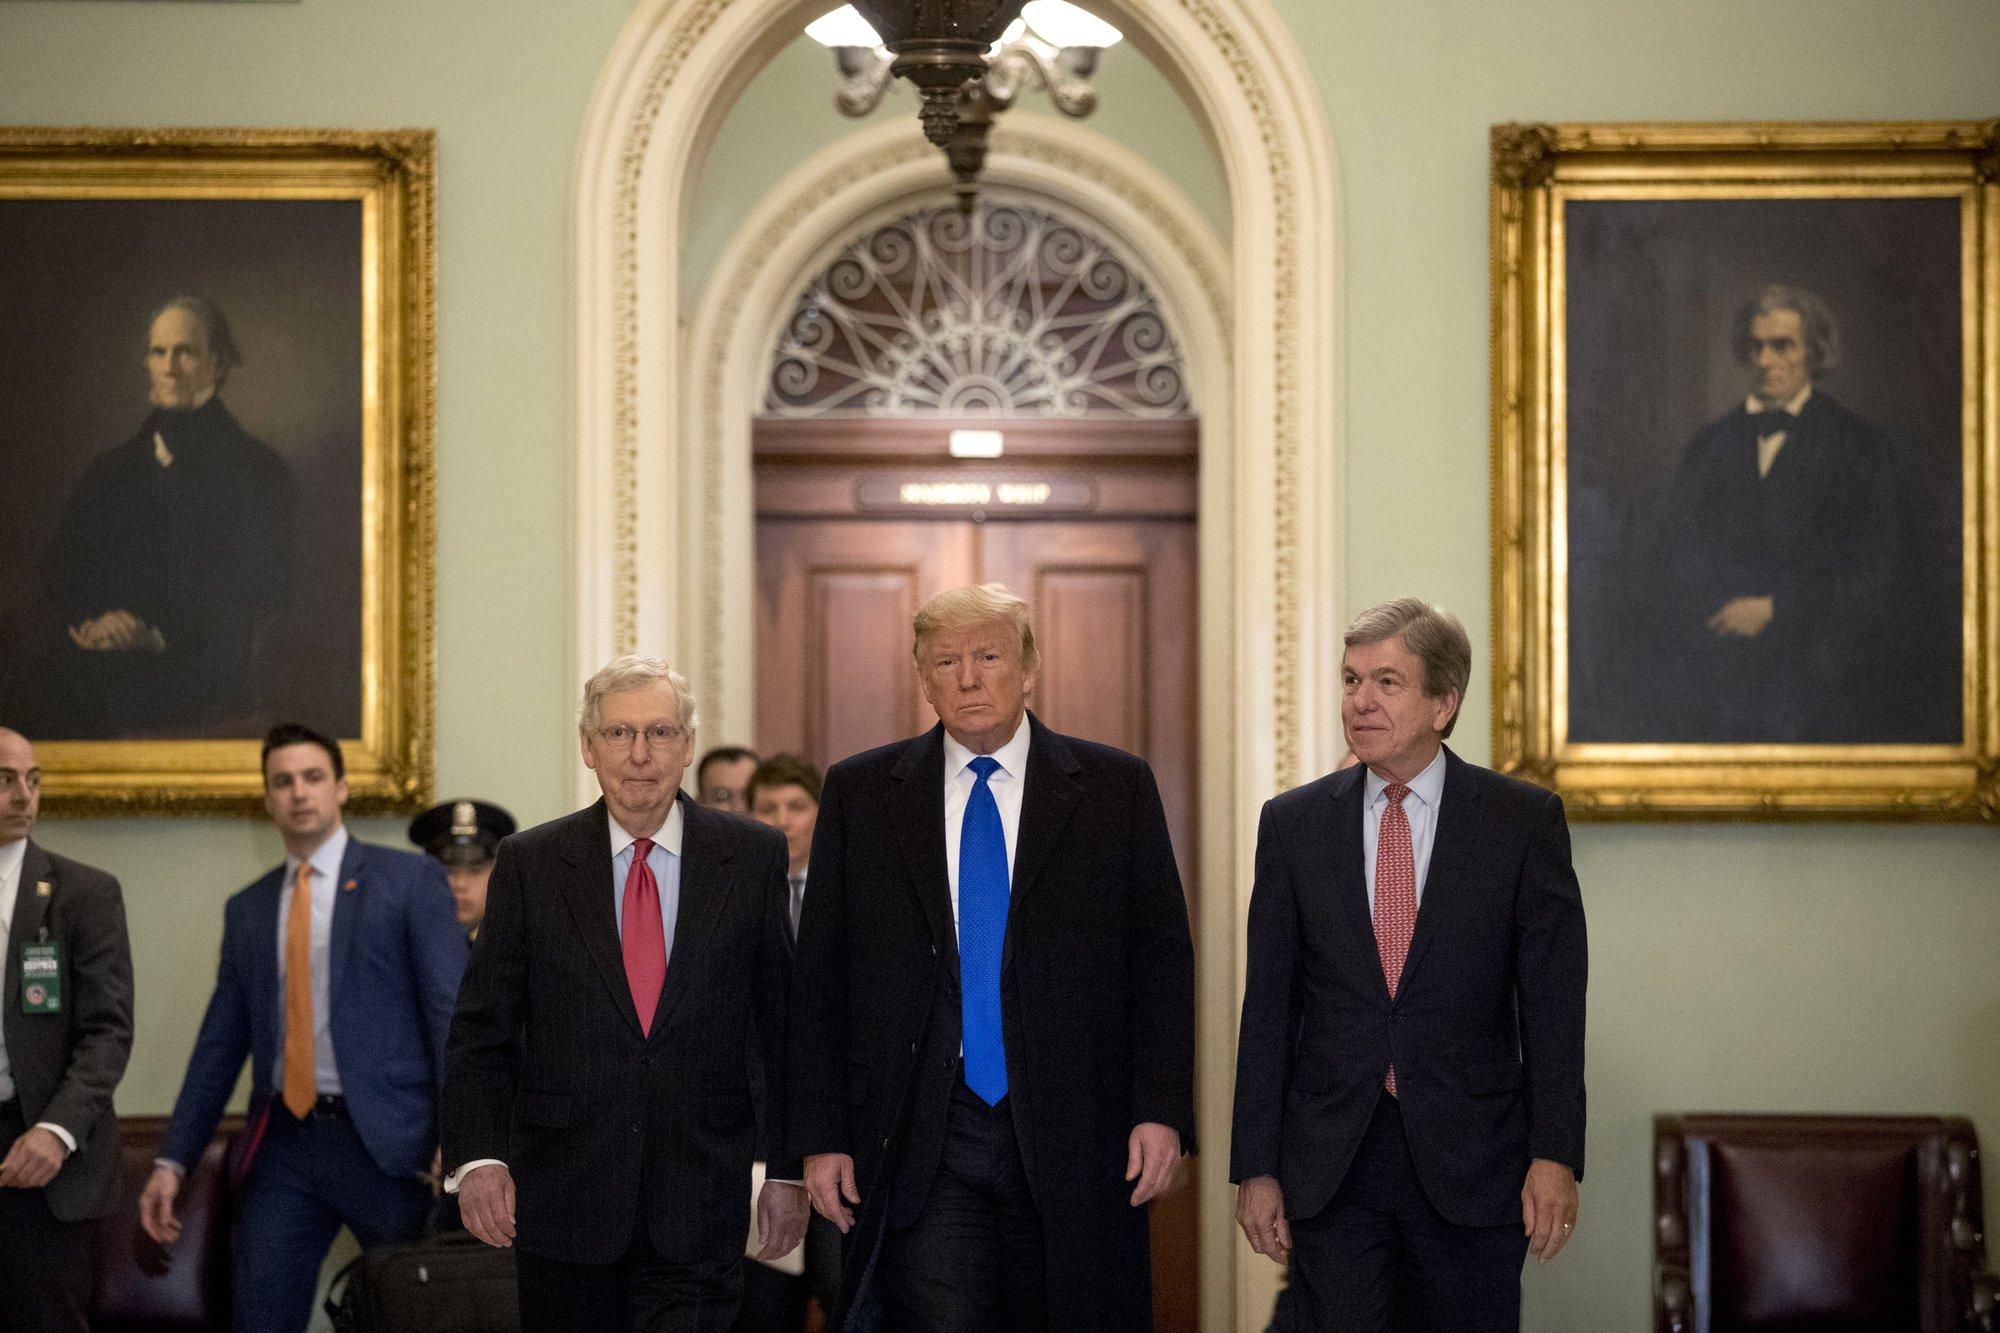 Democrats insist Barr release full Mueller report quickly